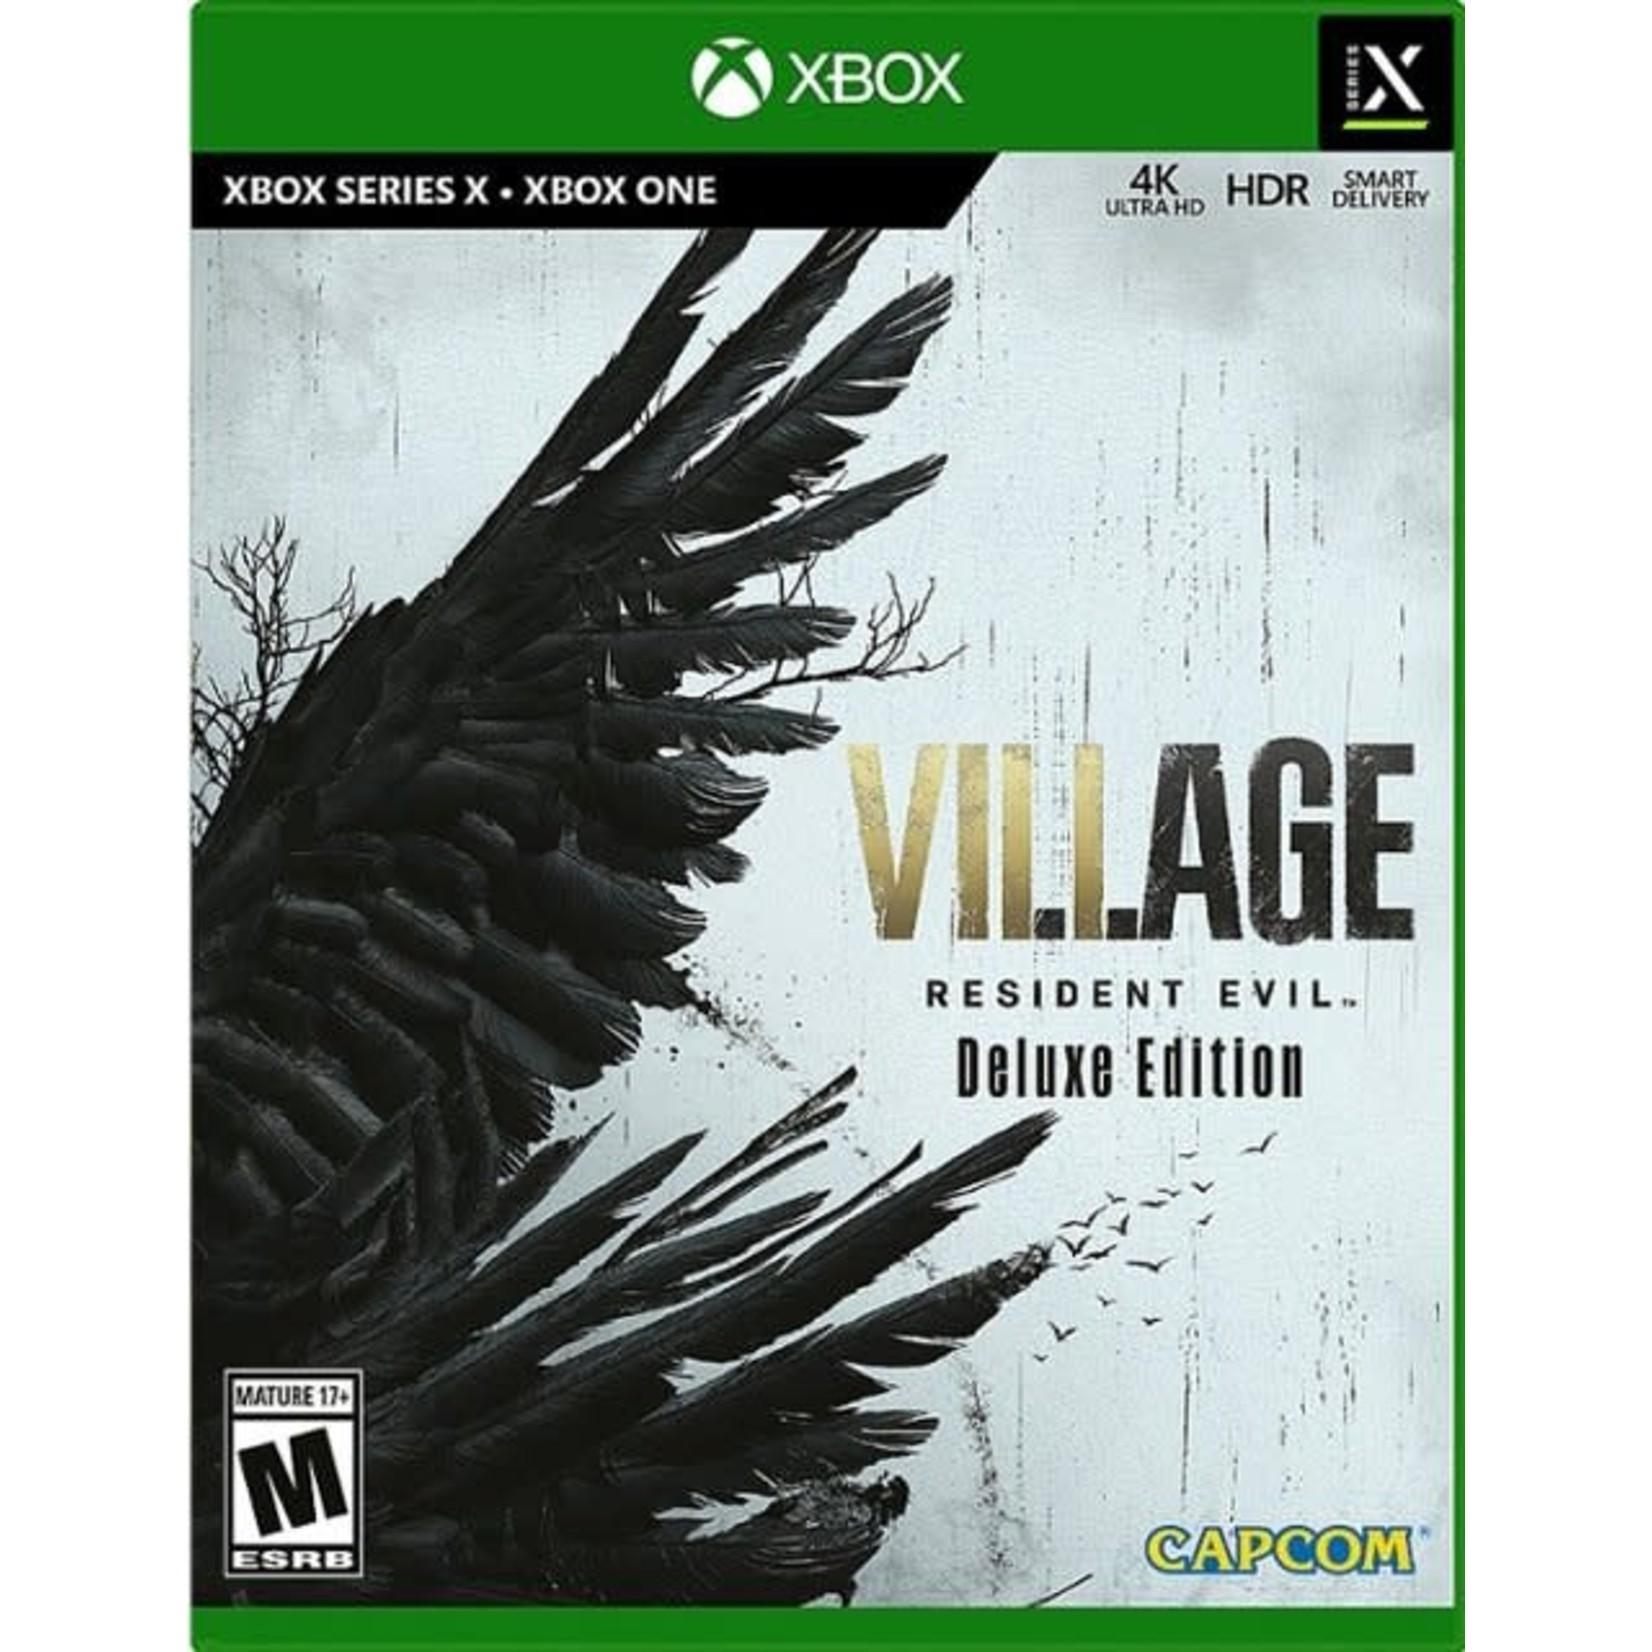 XB1-Resident Evil Village Deluxe Edition